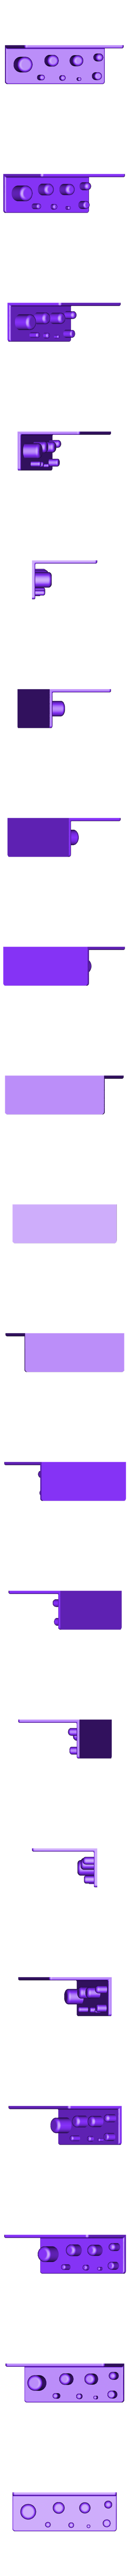 Screws.stl Download free STL file Wall Mount for Power Adapter Set 8pcs 002 I for screws or peg board • 3D printer object, Wiesemann1893